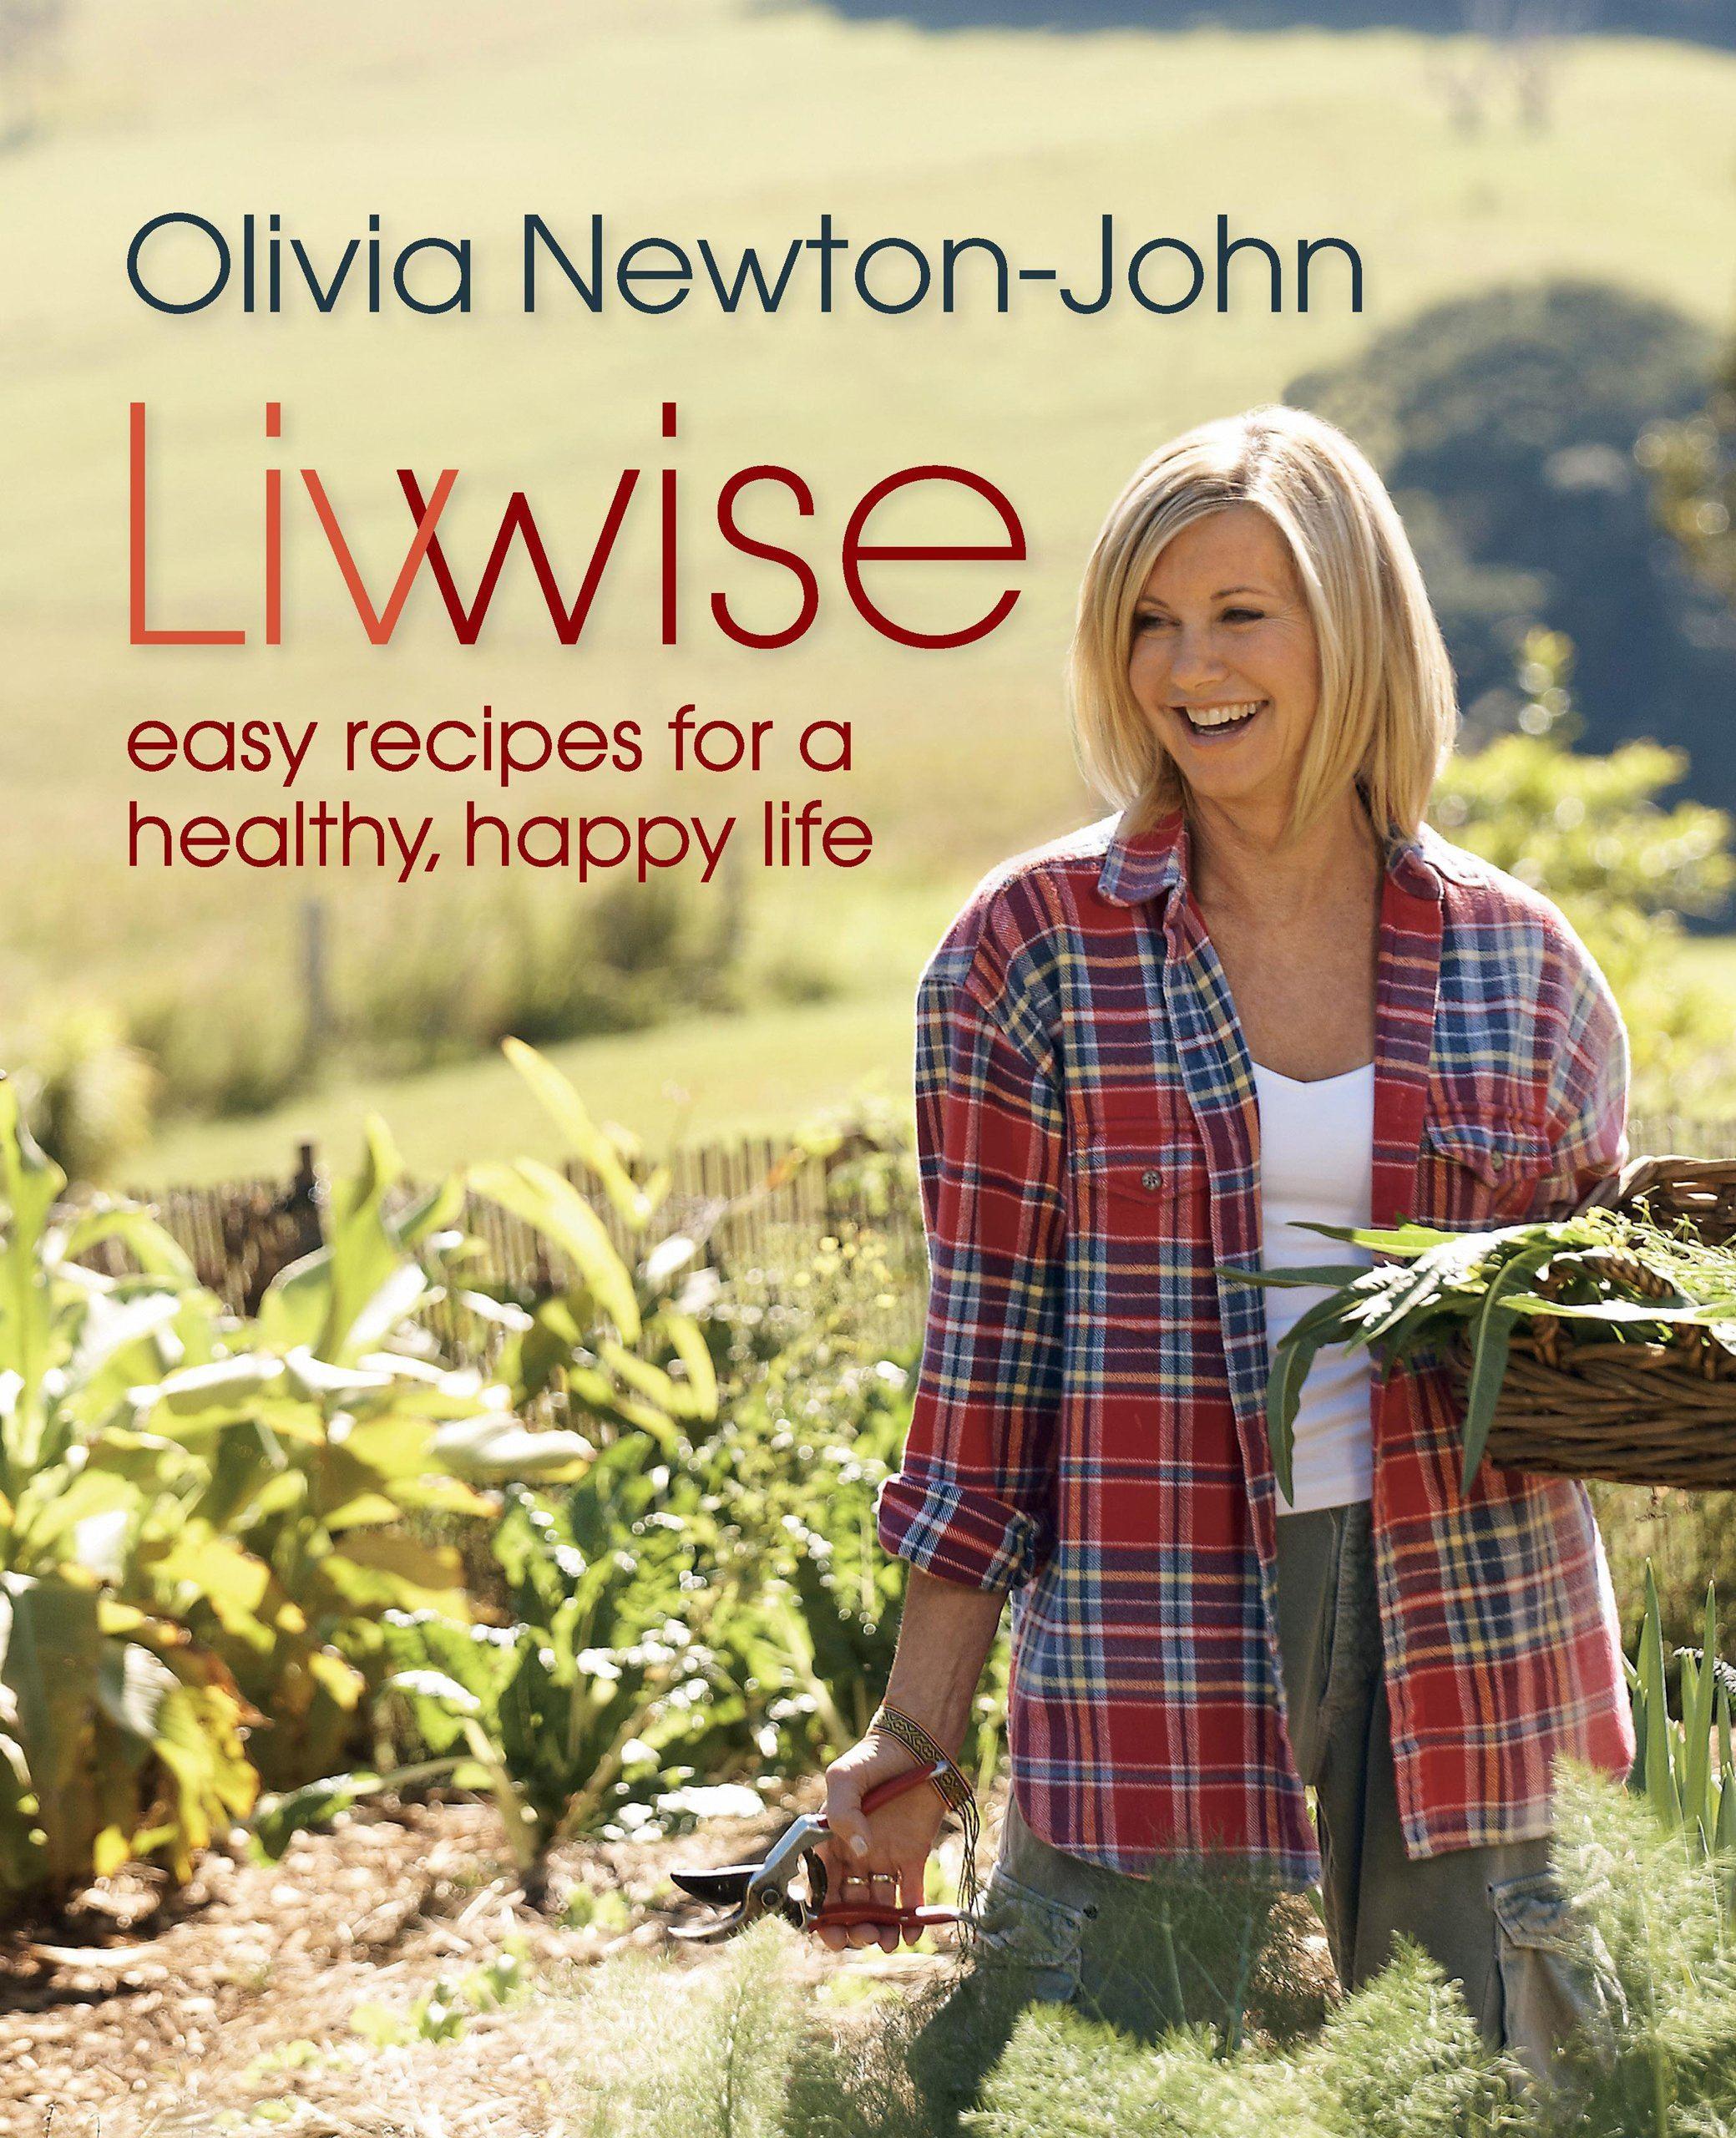 Olivia-Newton-John-cookbook